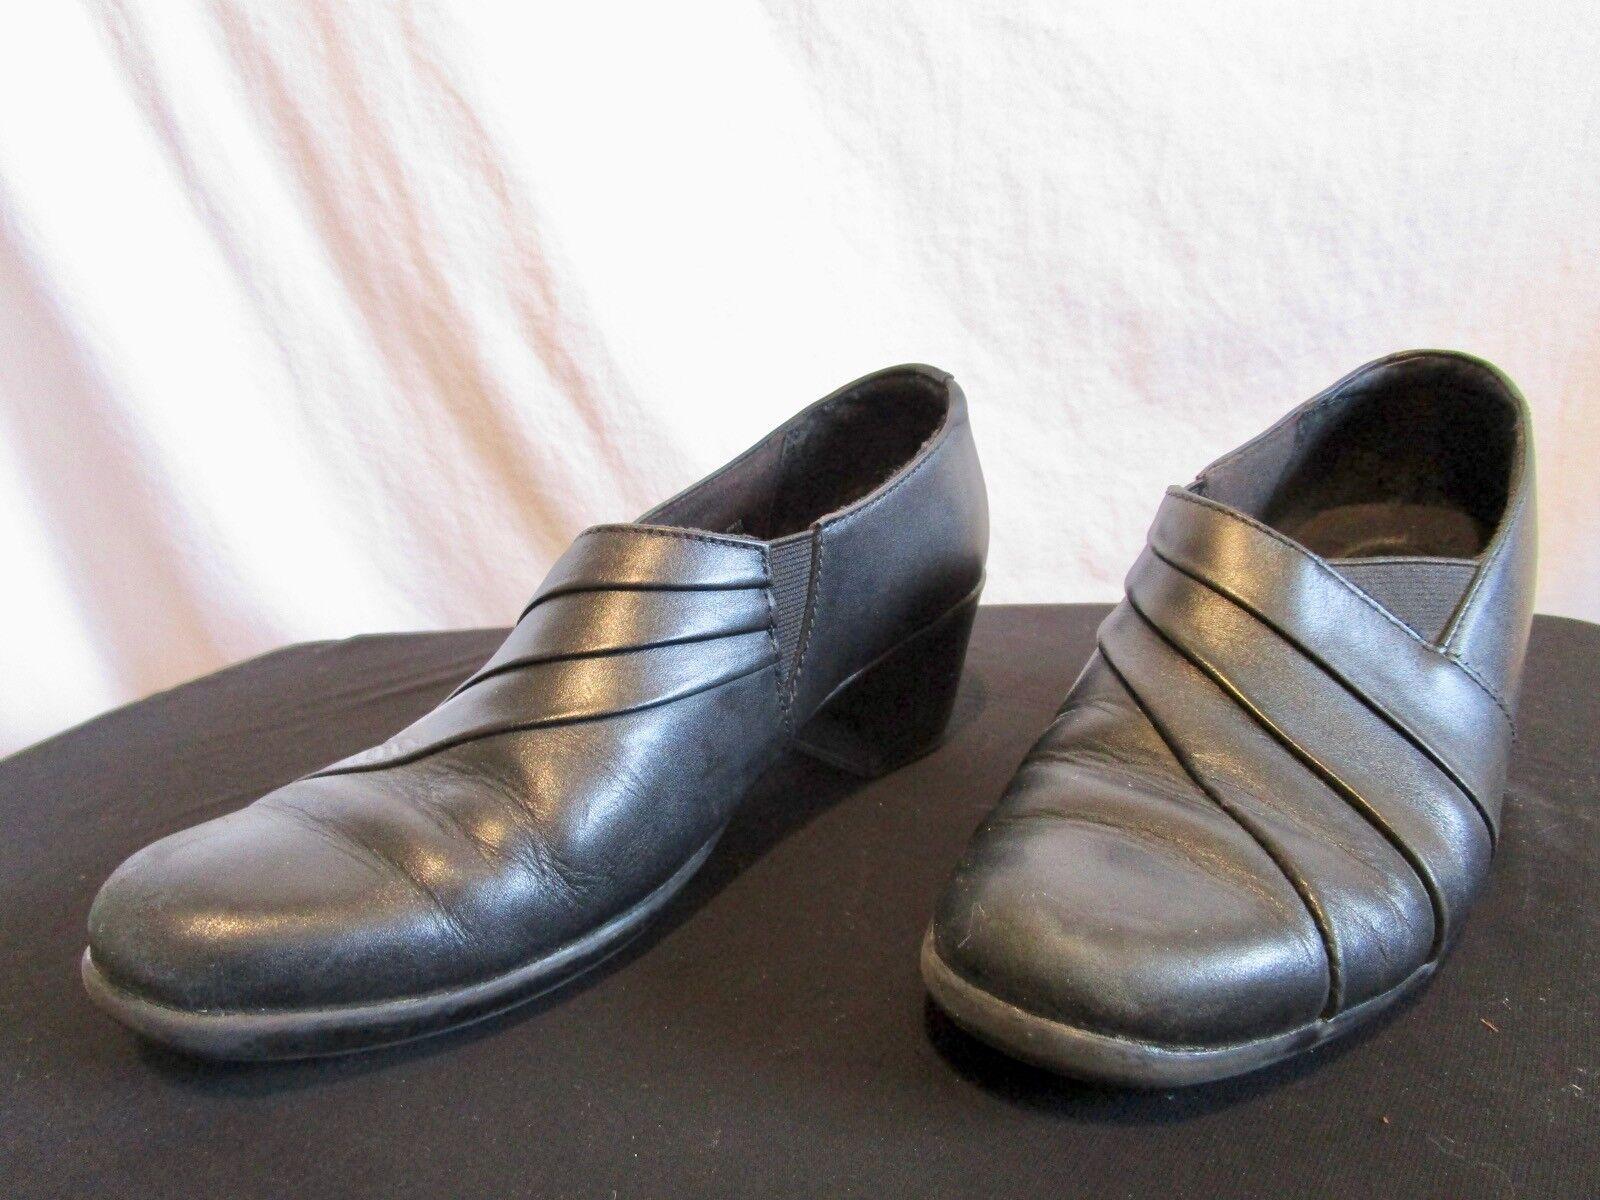 Clarks Bendables Black Leather Medium Heel Loafer Bootie Shoes Sz 7 M